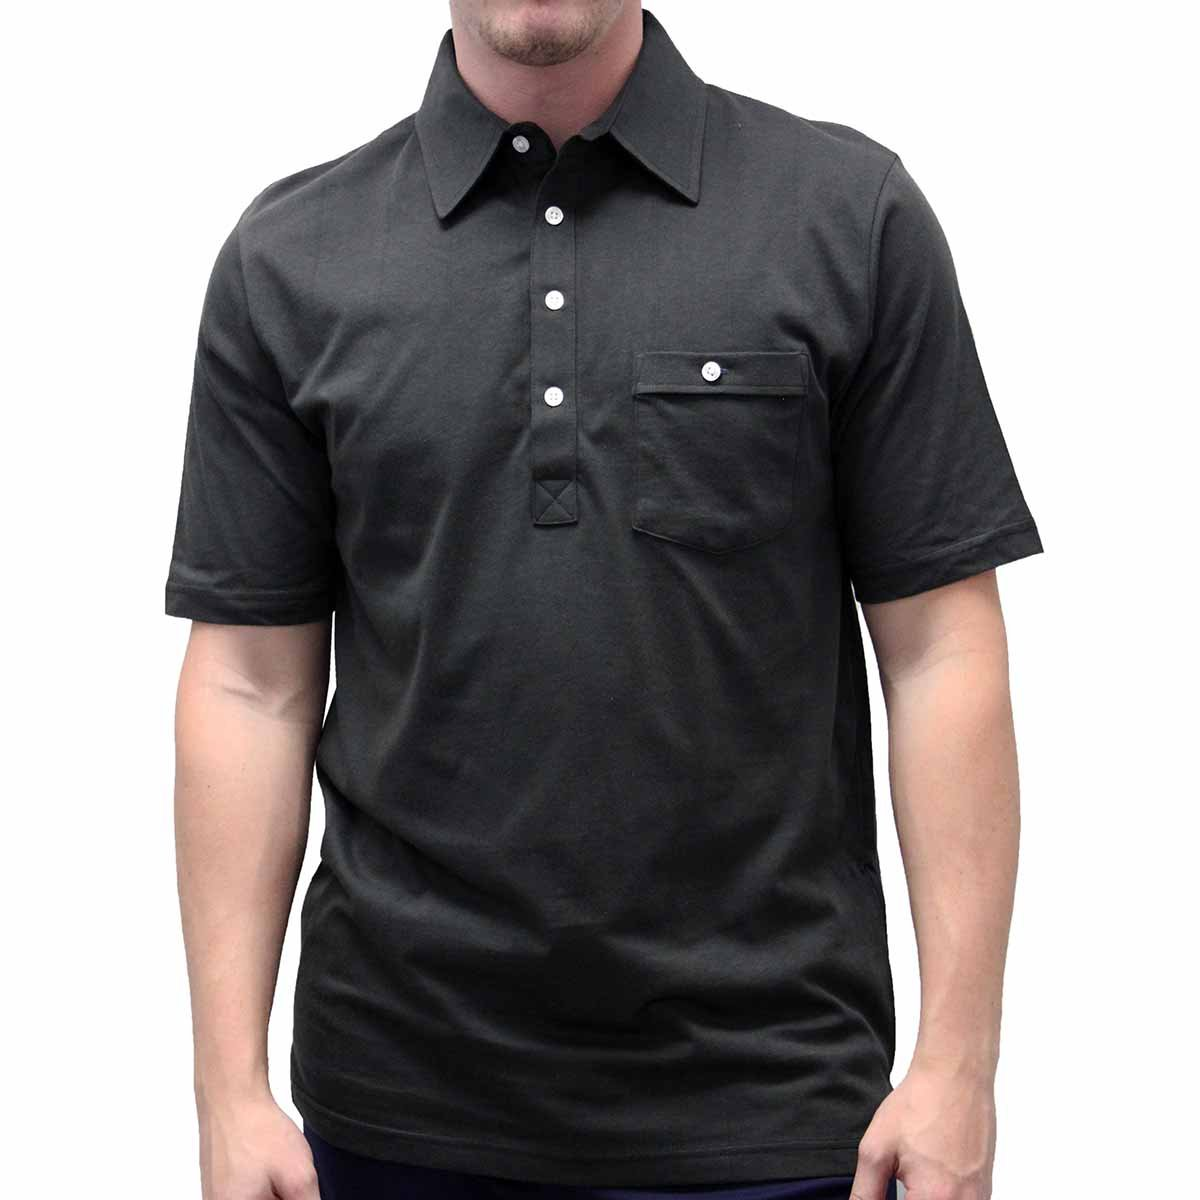 Palmland Solid Textured Short Sleeve Knit Big and Tall Black